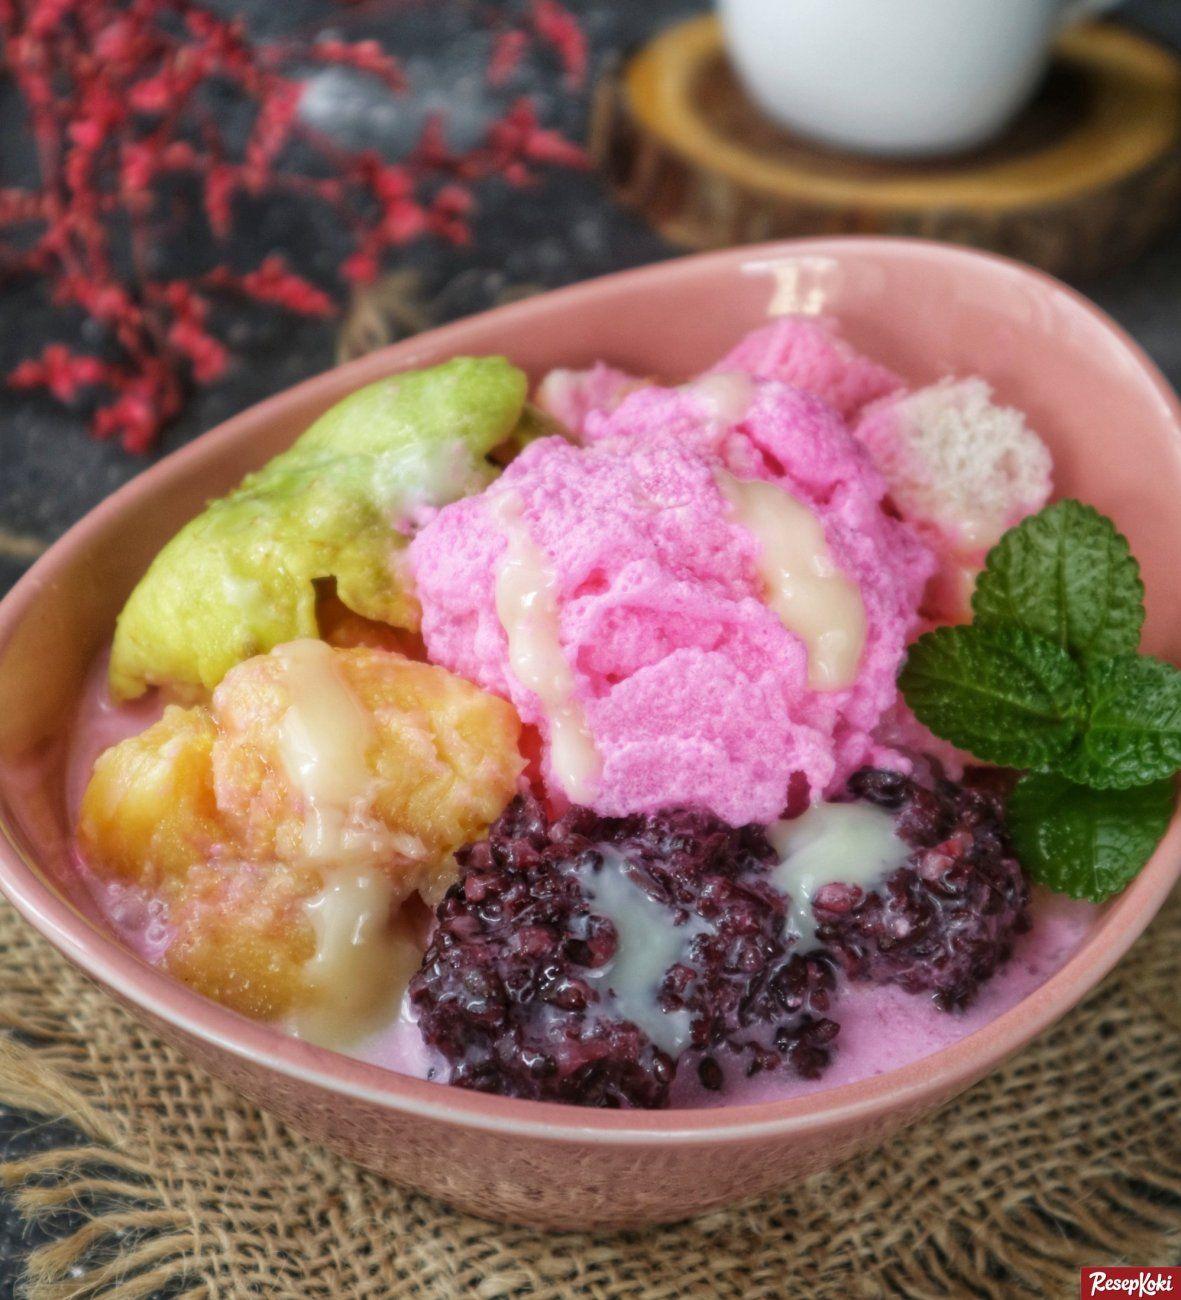 Es Doger Segar Manis Sederhana Resep Resepkoki Resep Di 2020 Resep Minuman Makanan Dan Minuman Resep